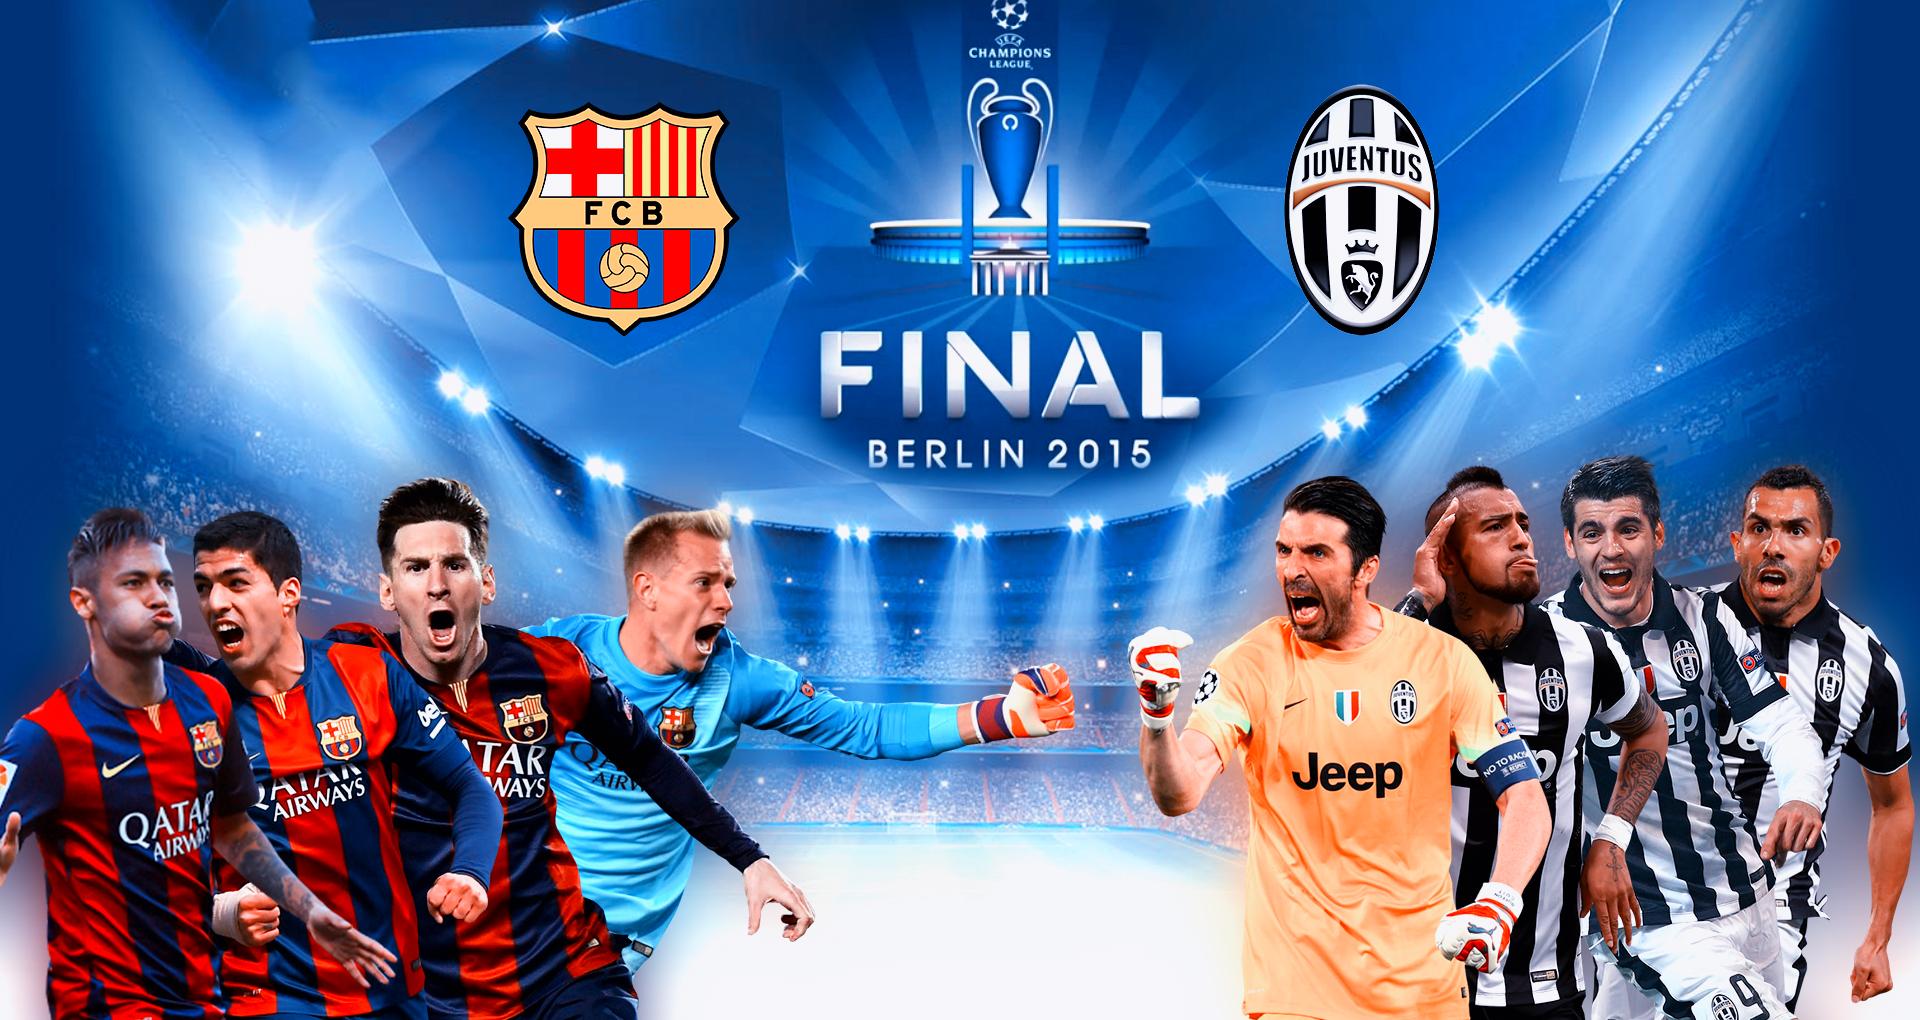 Barcelona Vs Juventus Ucl Final Berlin Wallpaper By Rakagfx On Deviantart